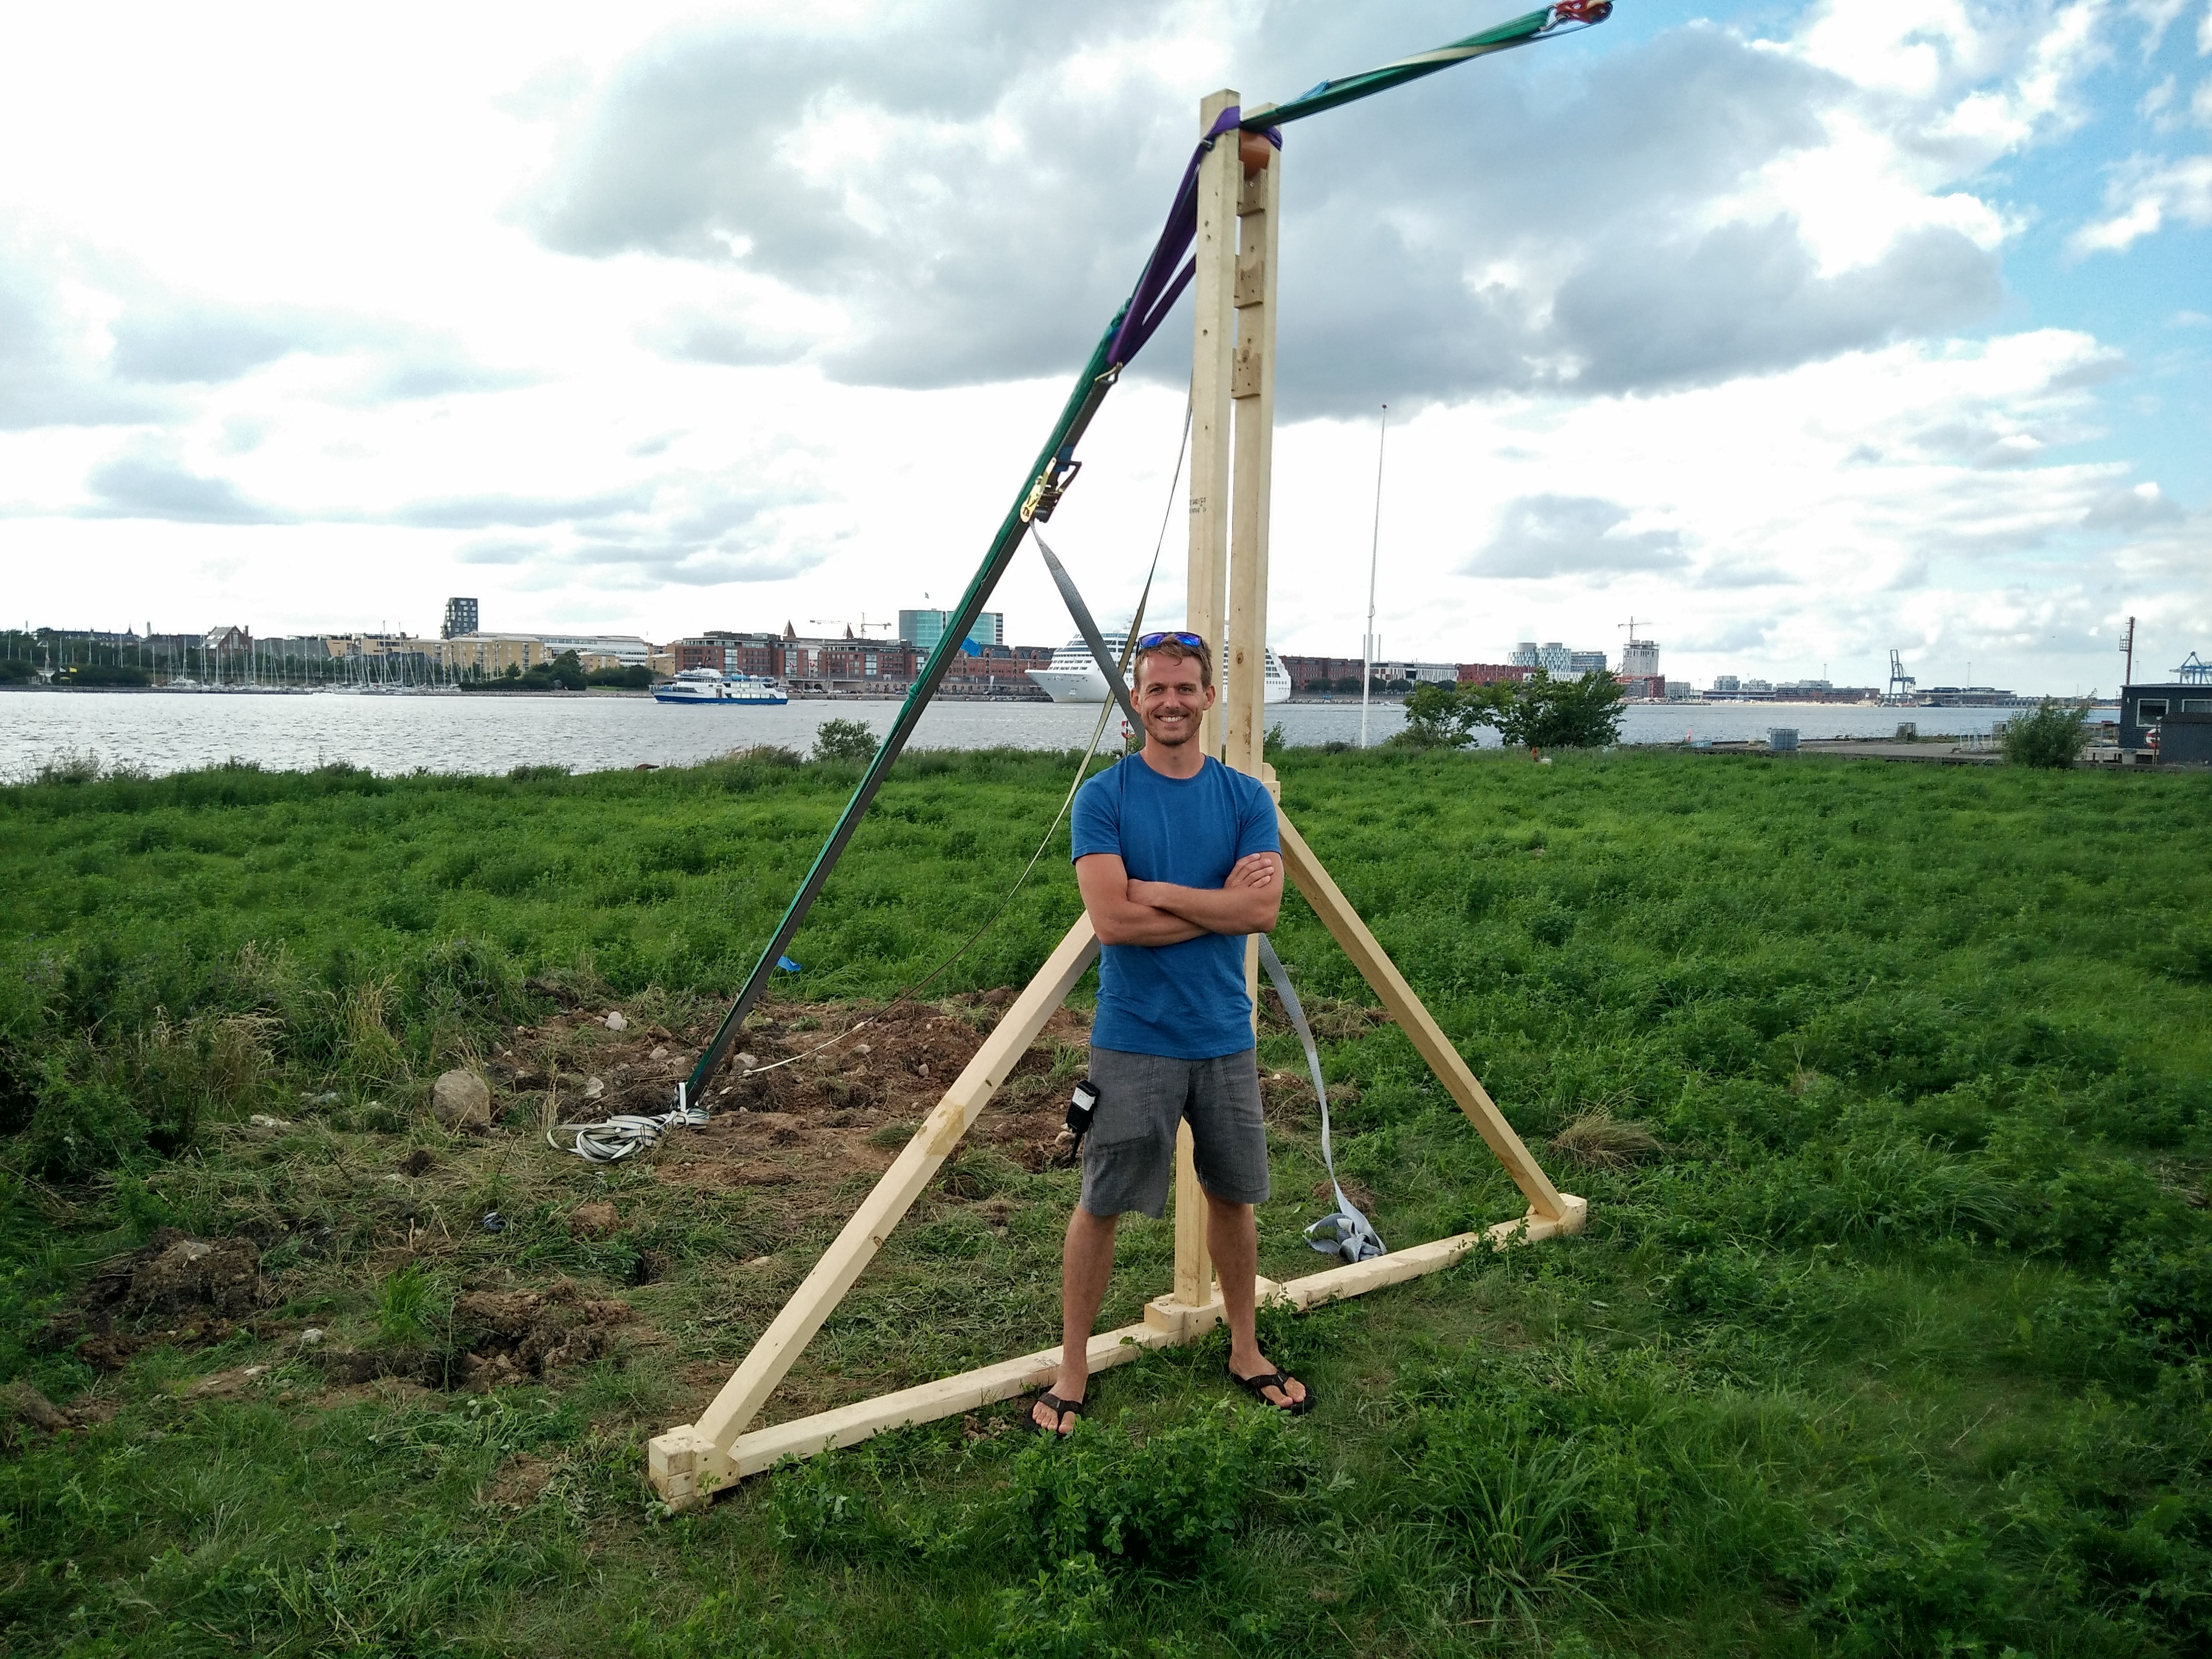 Stowable Slackline A-frame – Northern Edge Crew